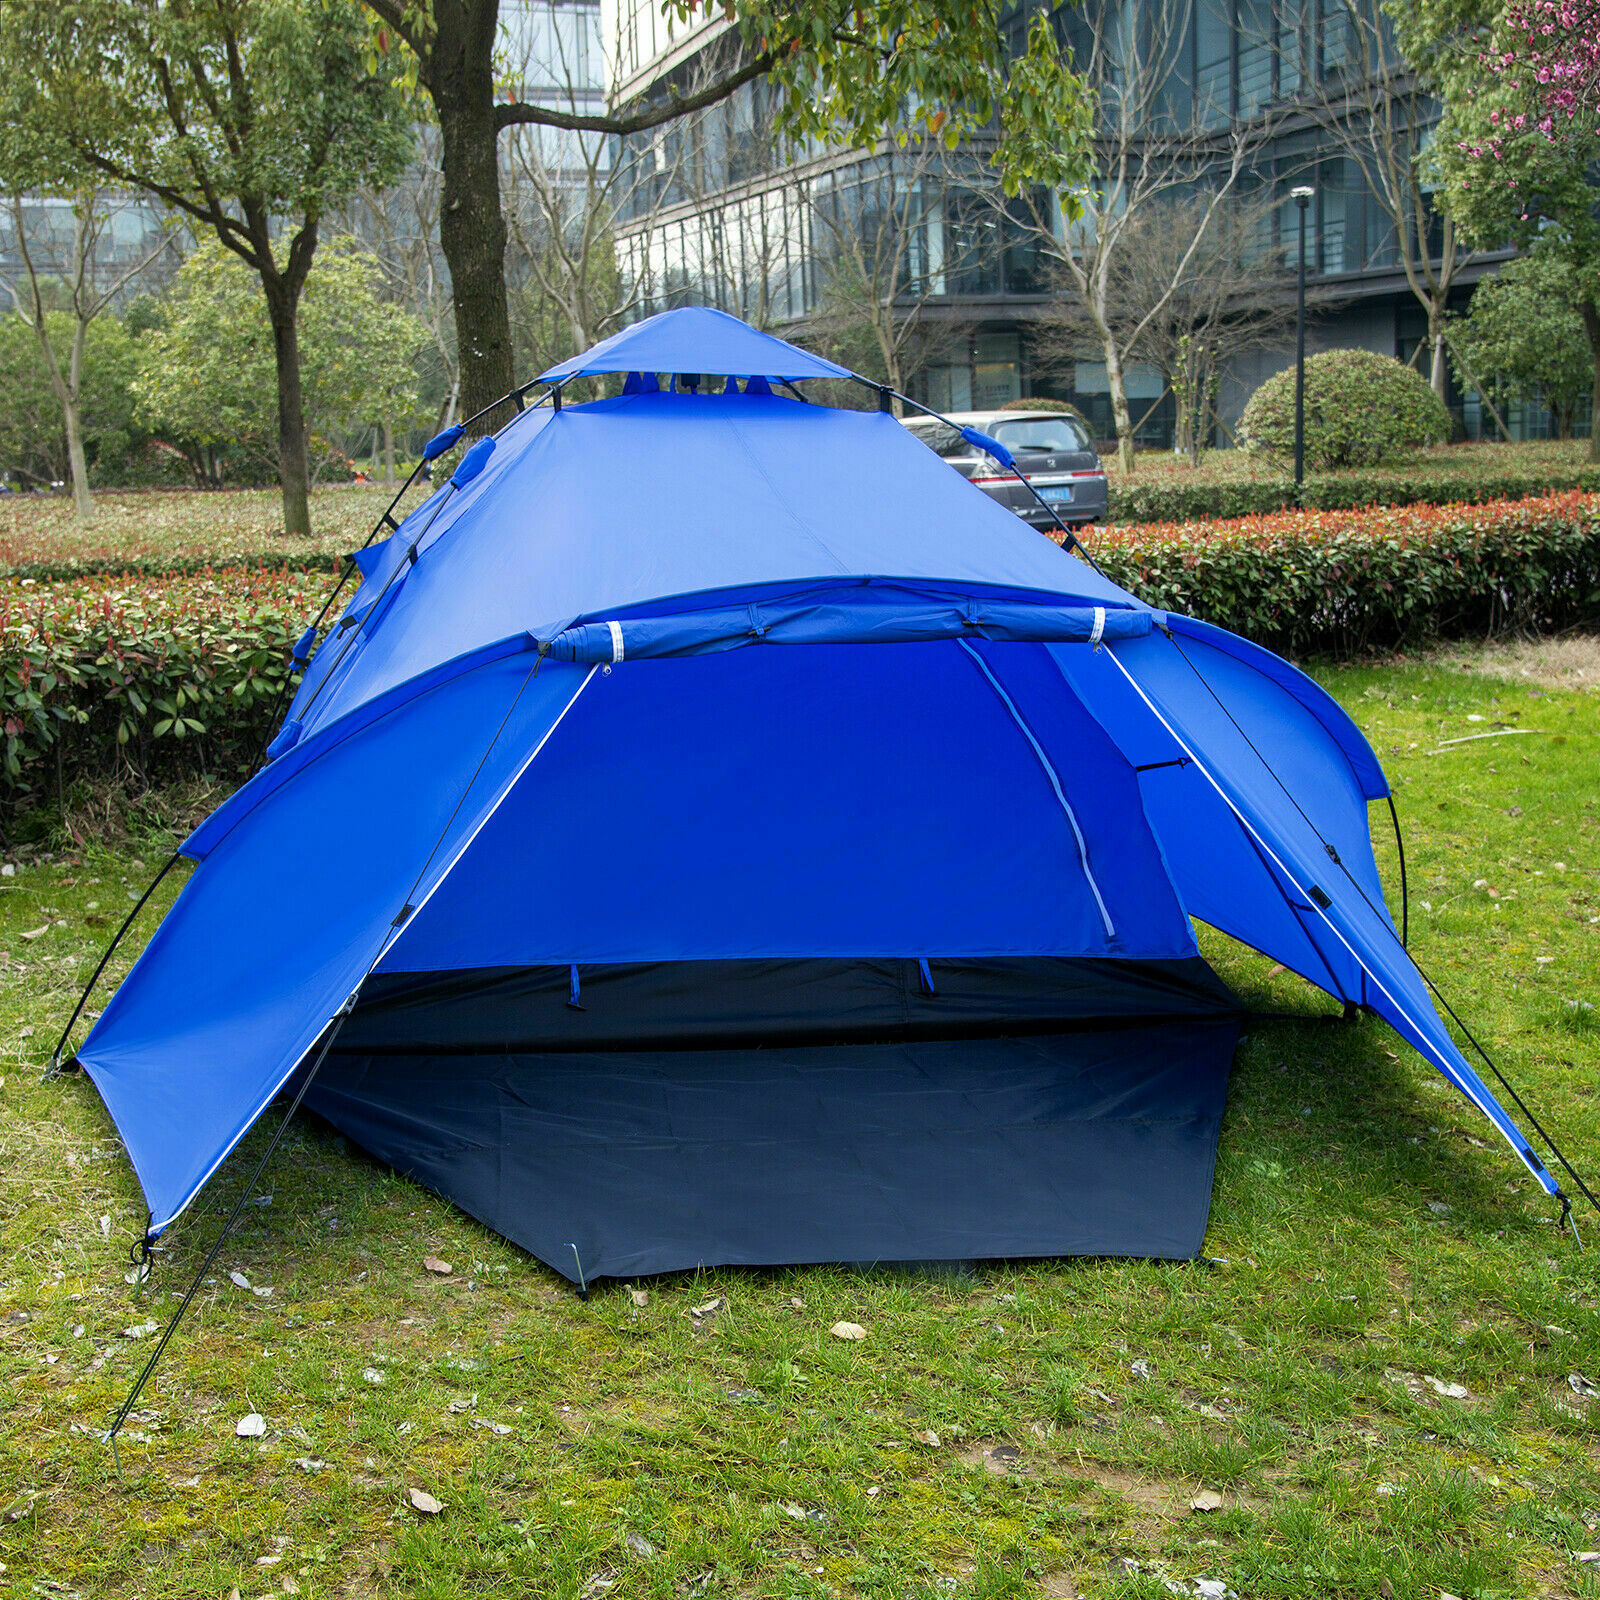 Outdoor Pop Up Wurfzelt leichtes 3-4 Personen Camping Festival Sekundenzelt Zelt